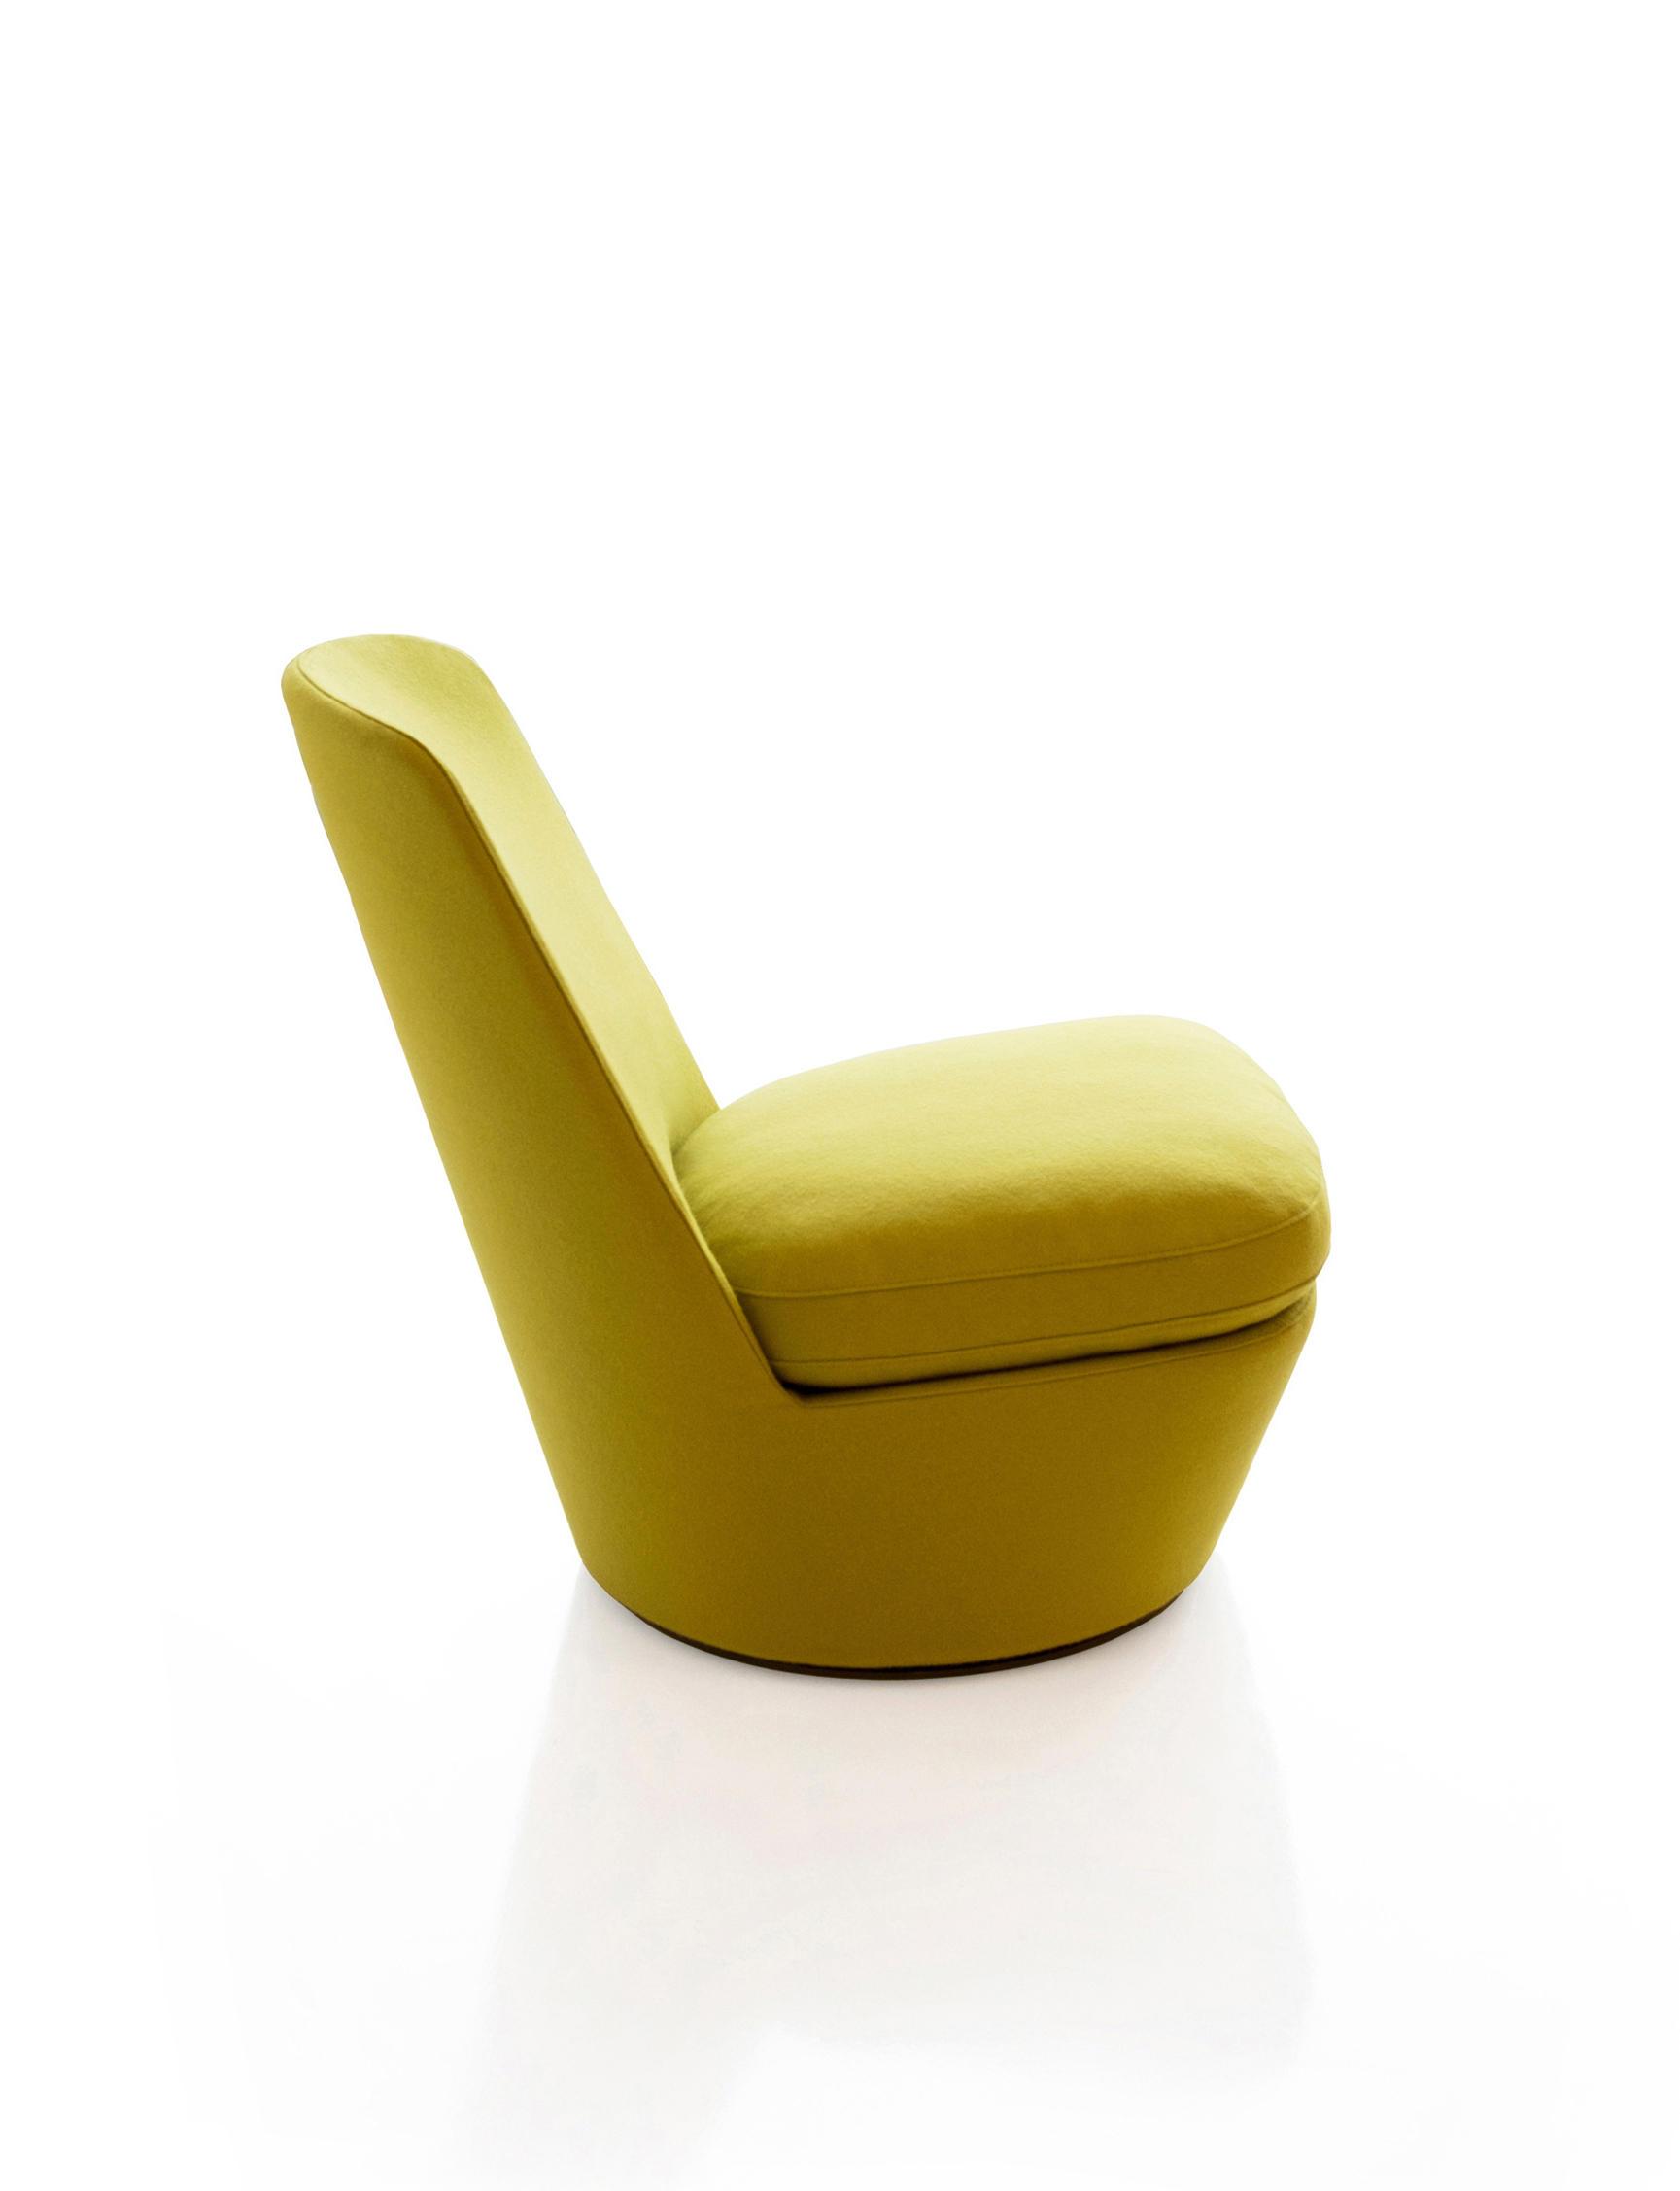 Pre Chair by Bensen